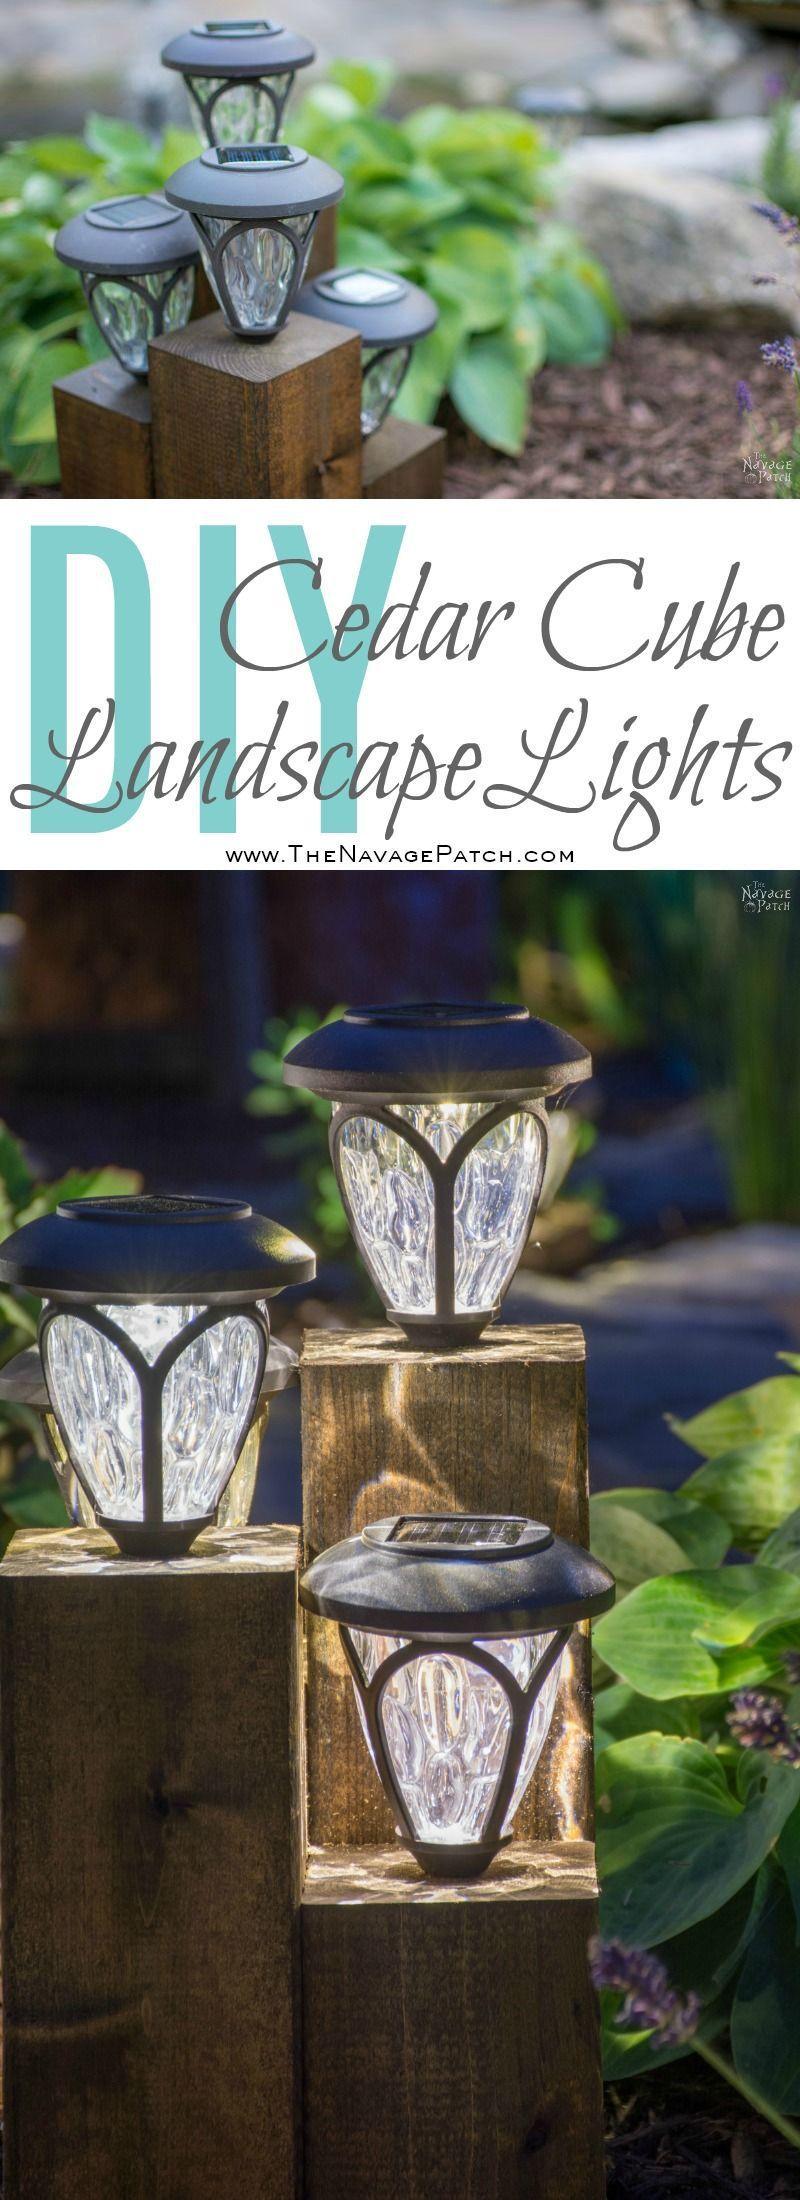 DIY Cedar Cube Solar Landscape Lights outdoors